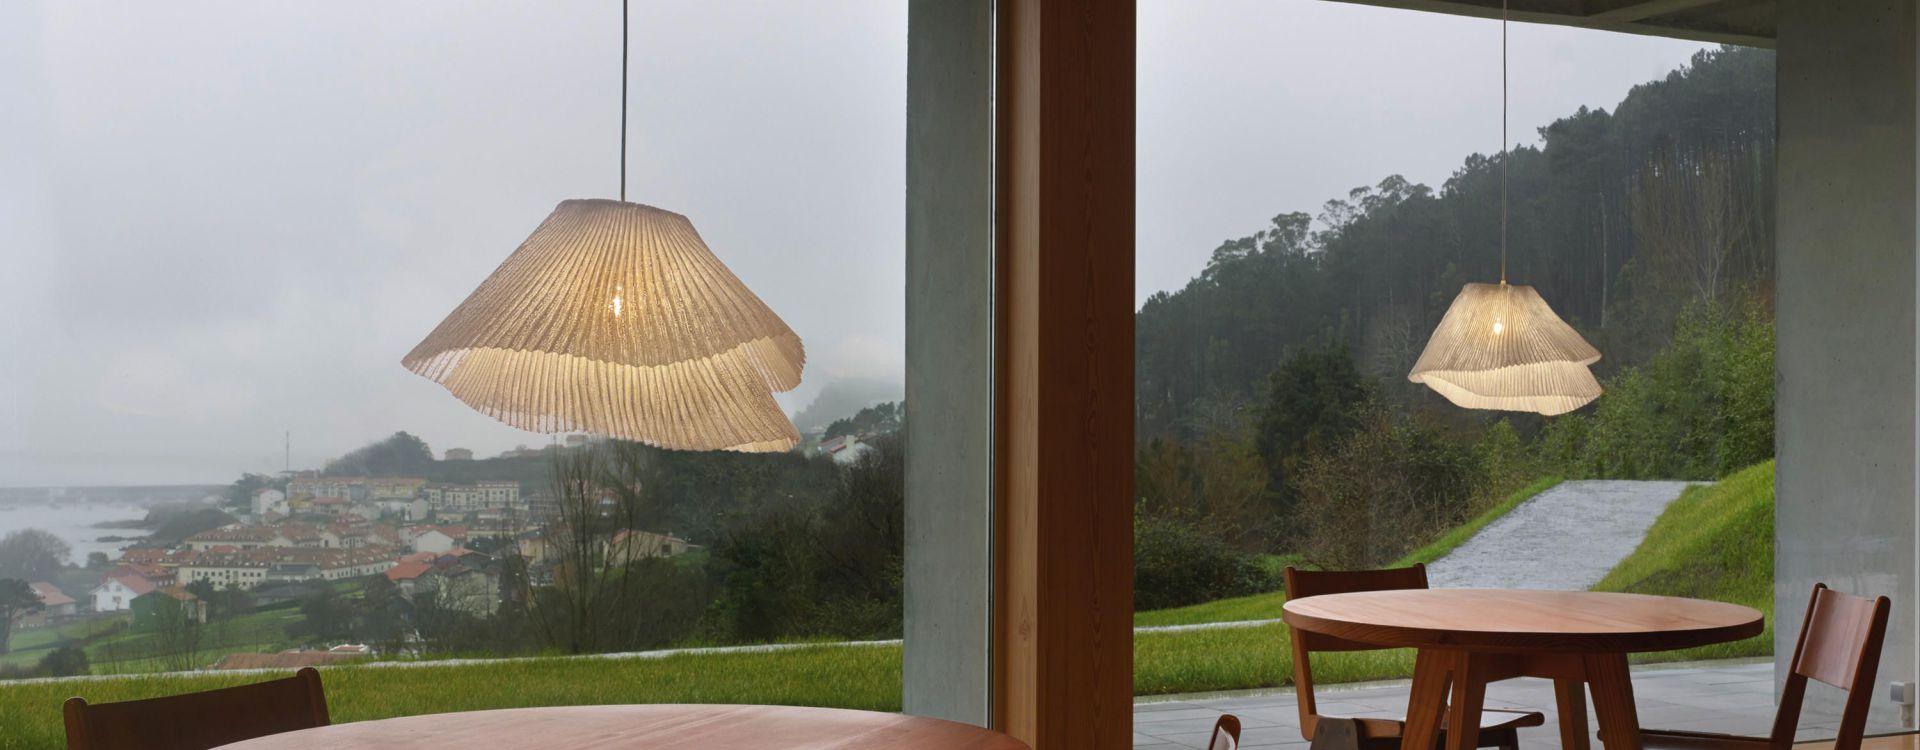 Tempo Vivace Pendant Lamp